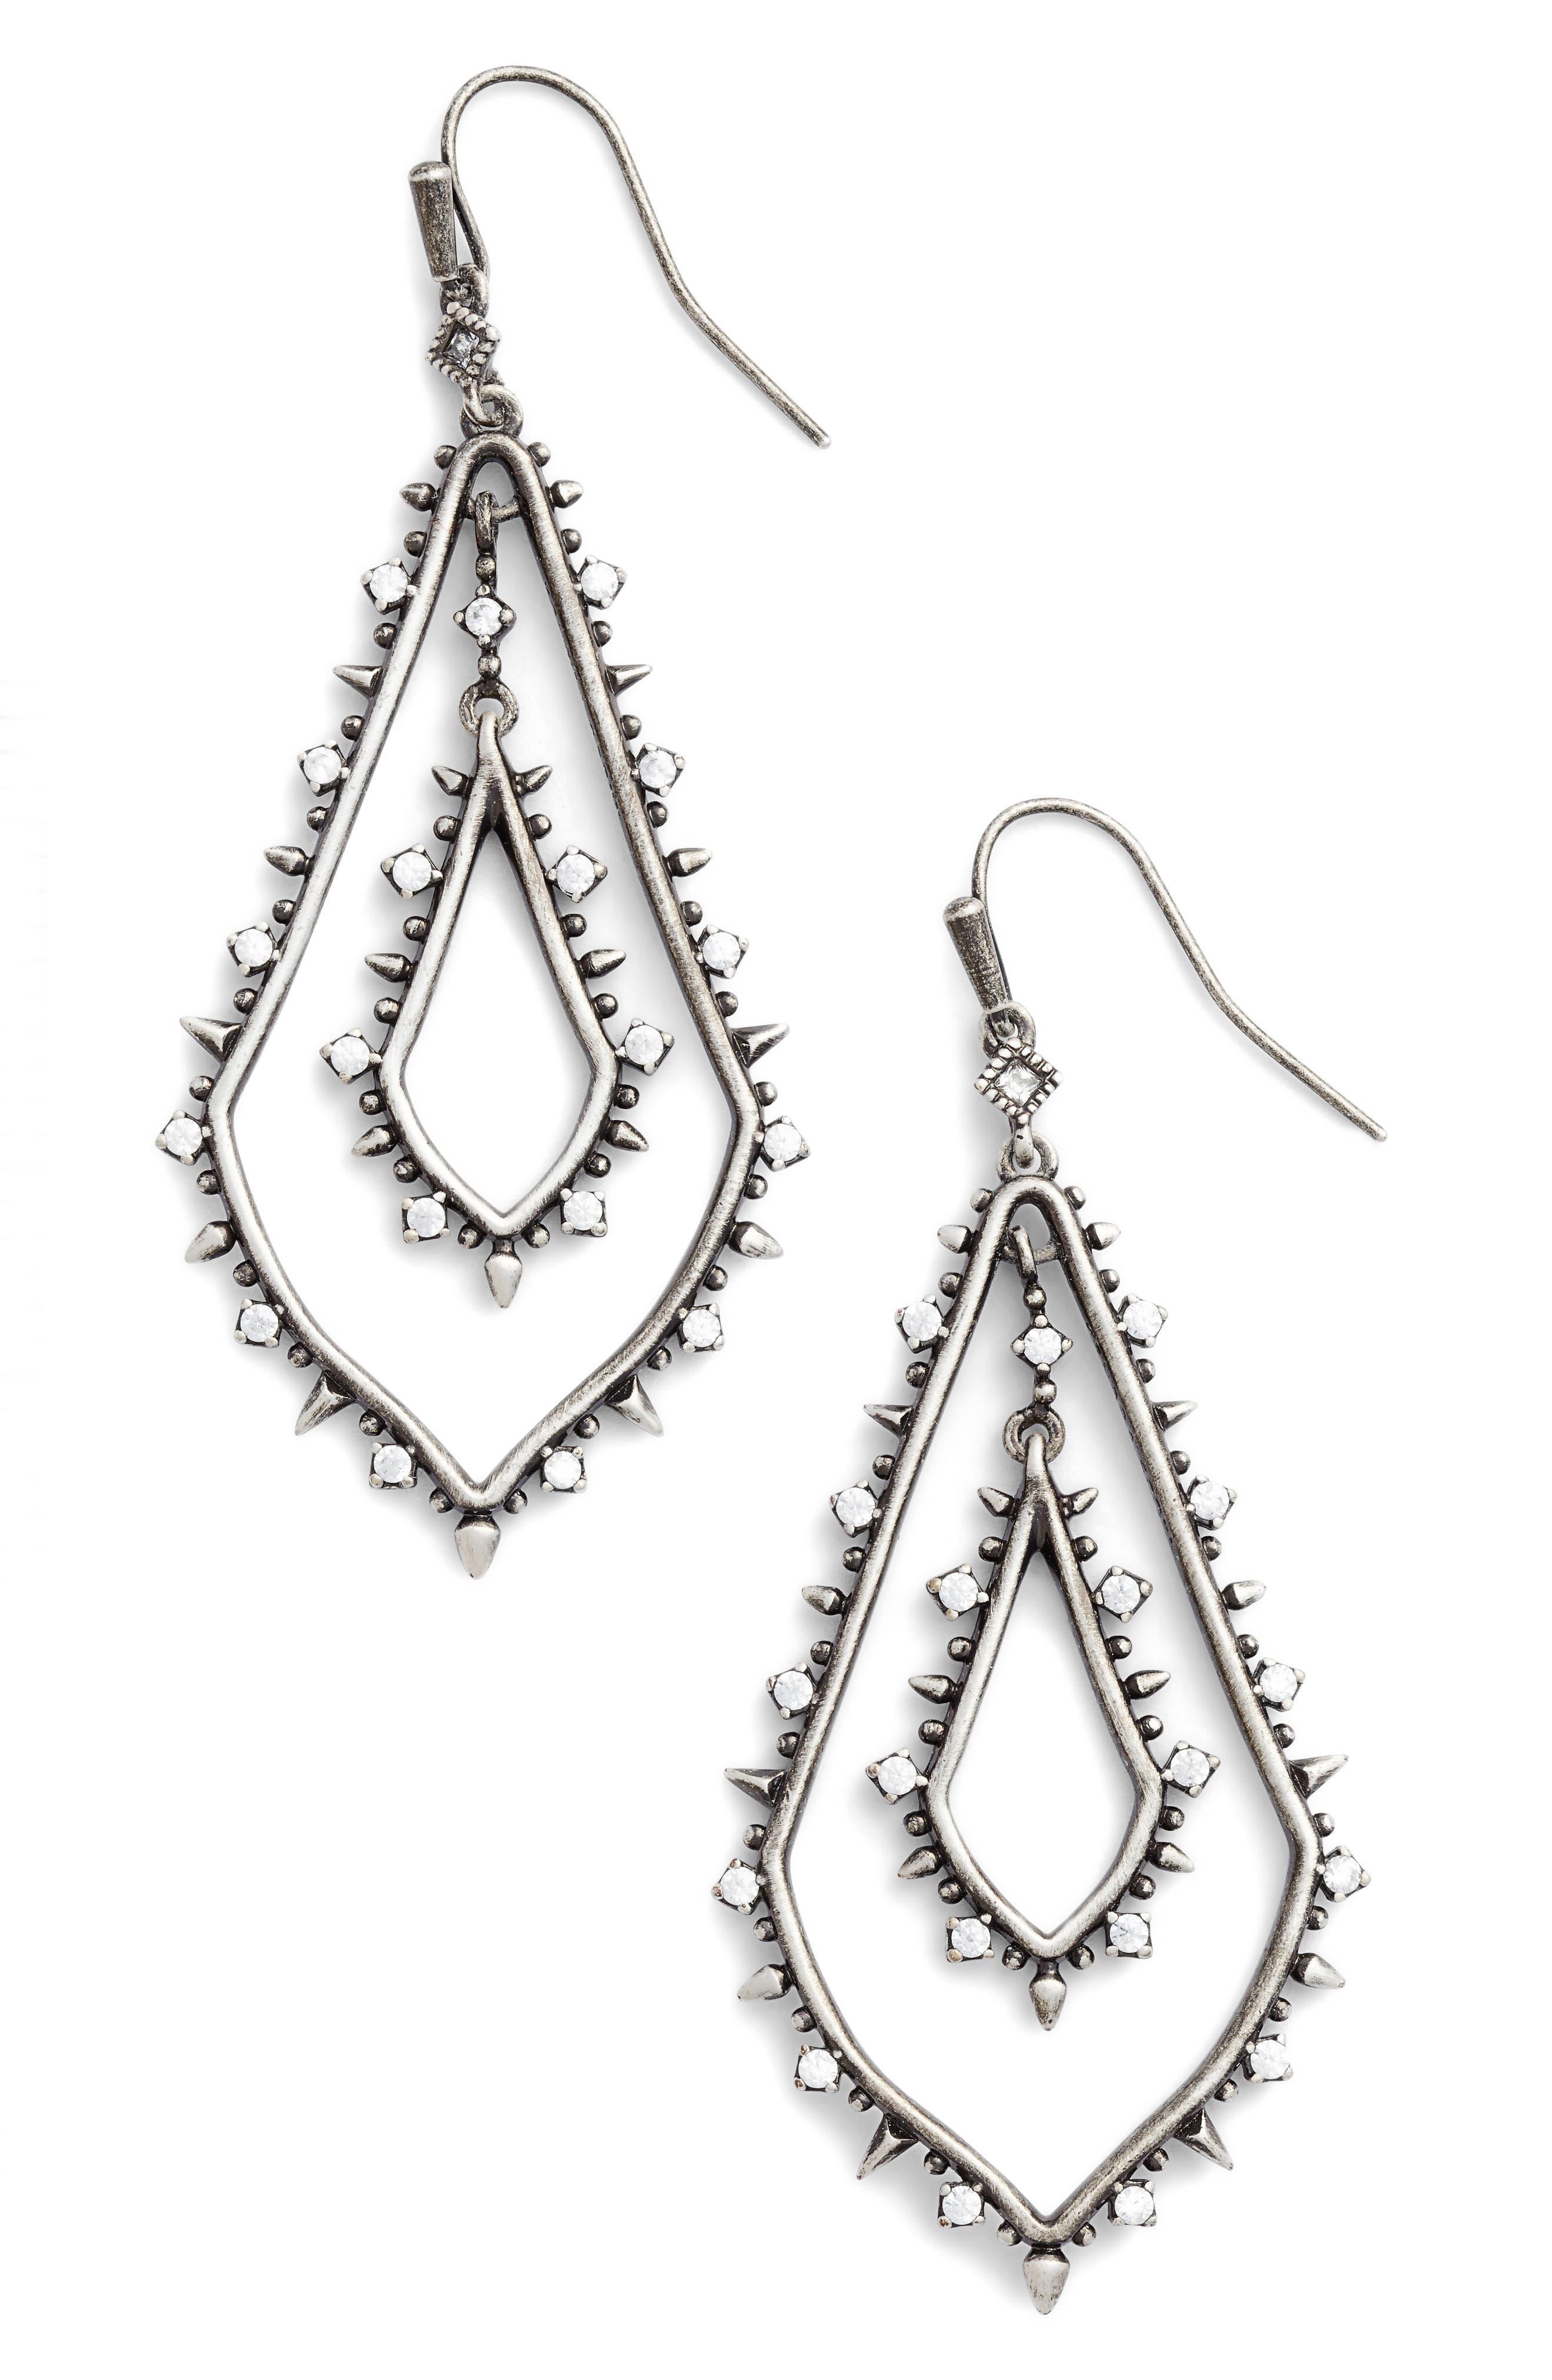 Alice Drop Earrings,                             Main thumbnail 1, color,                             Antique Silver